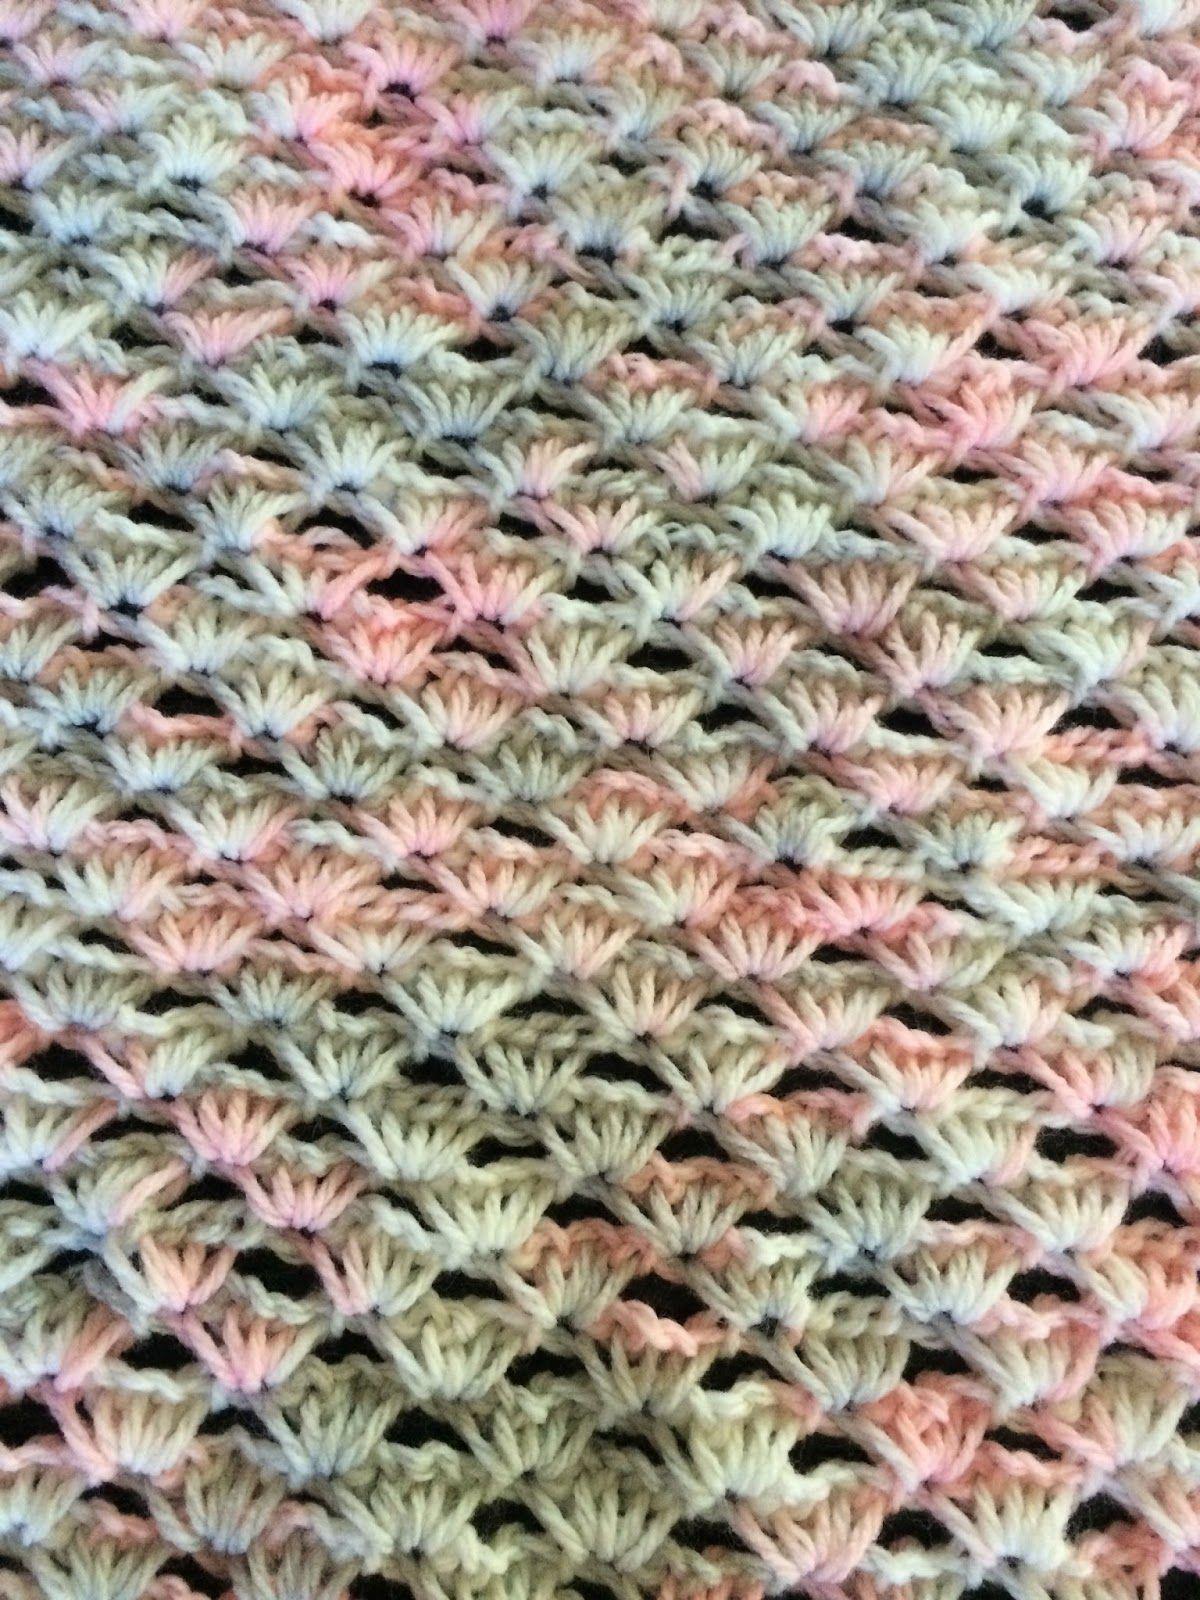 Fiddle baby comfort blanket tunisian crochet not my nanas fiddle baby comfort blanket tunisian crochet not my nanas crochet bankloansurffo Gallery